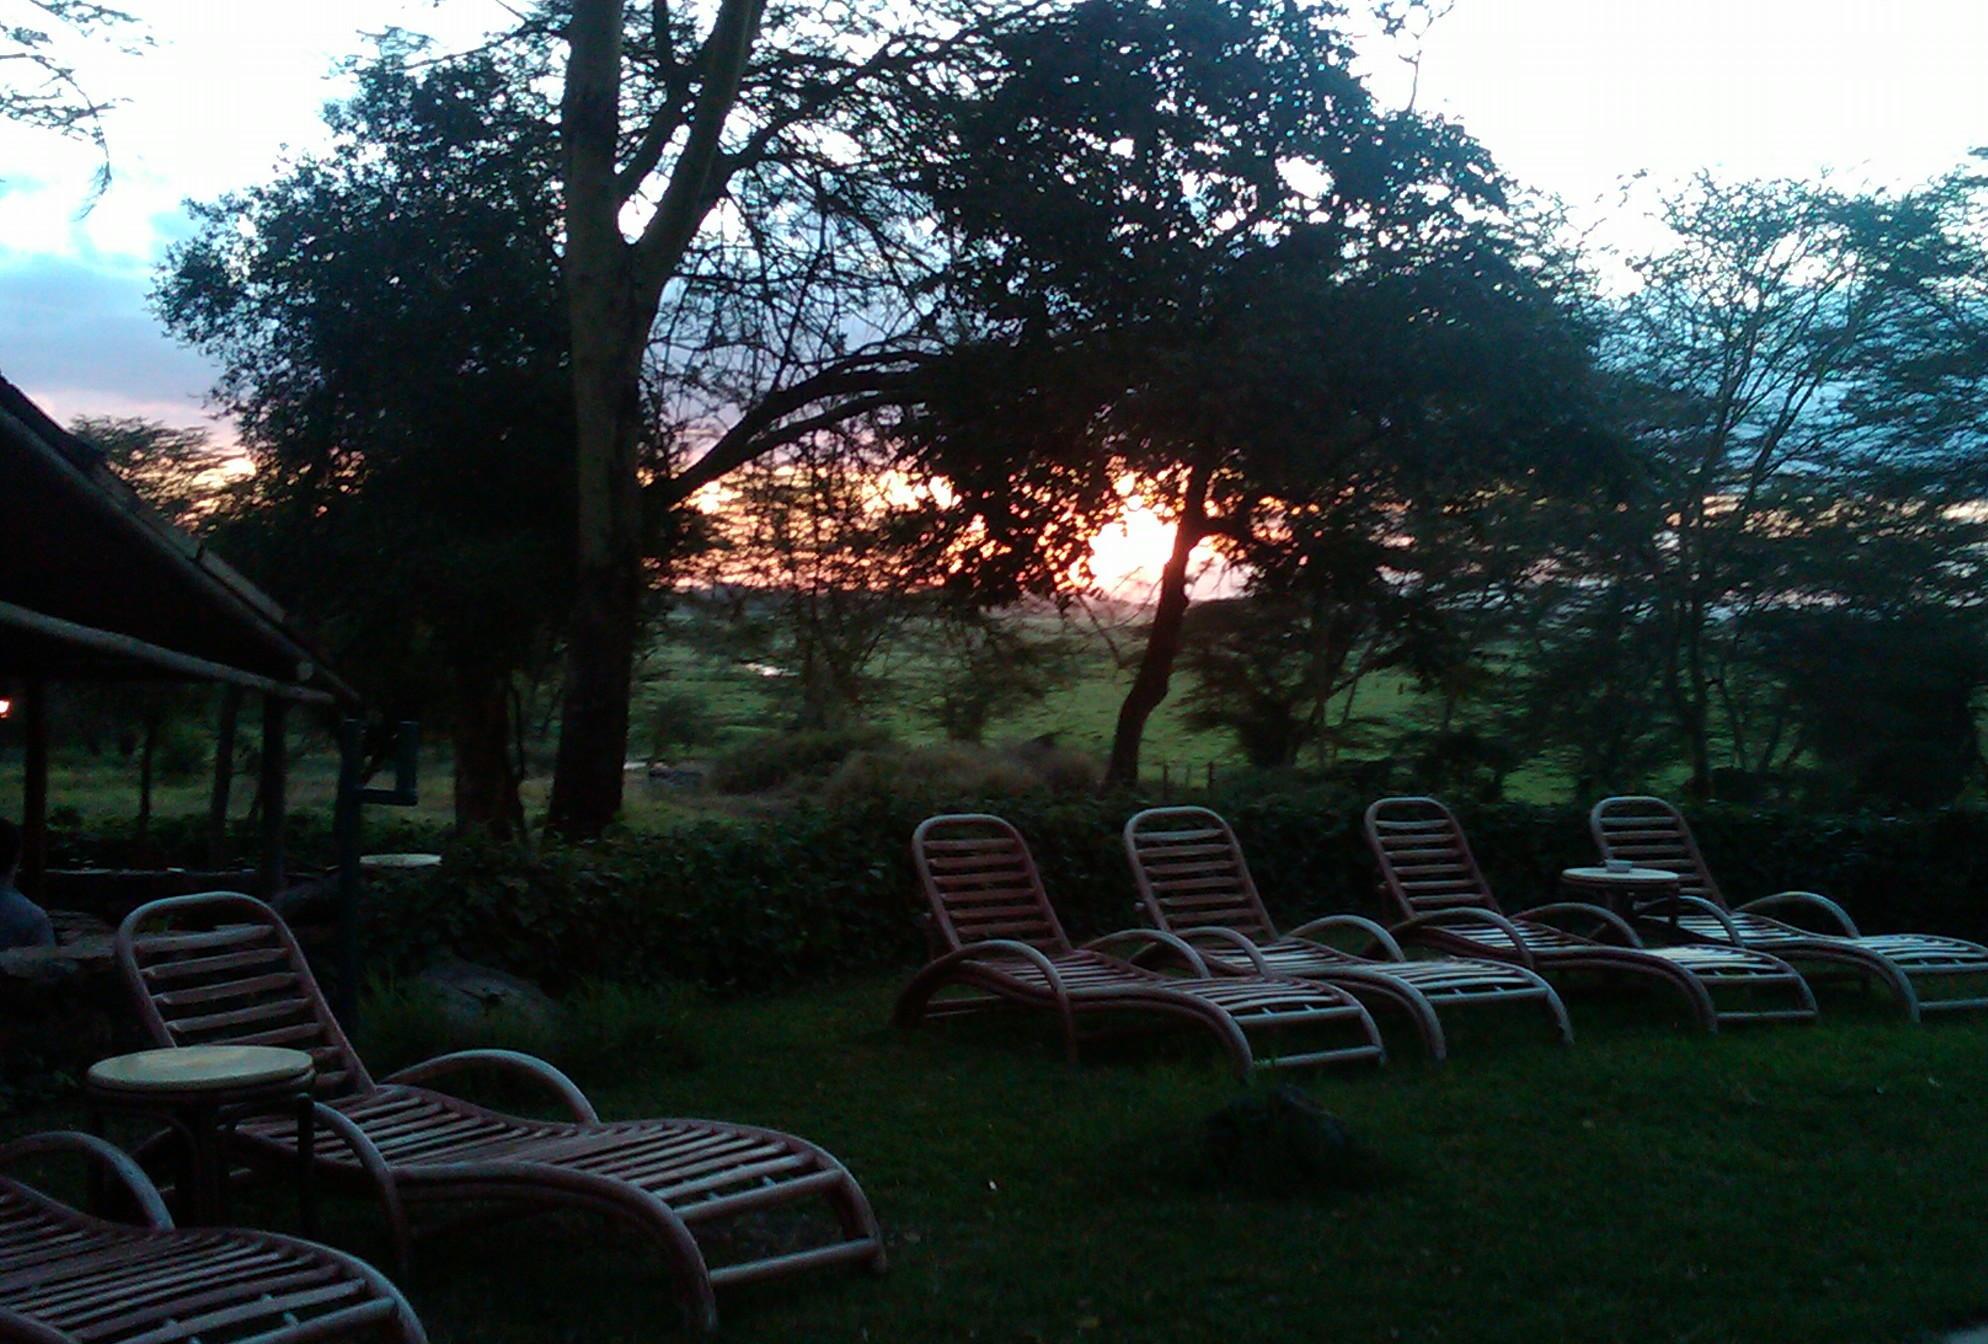 Sunrise at Serena Hotel, Amboseli National Park, Kenya 2014 © Flyga Twiga LLC